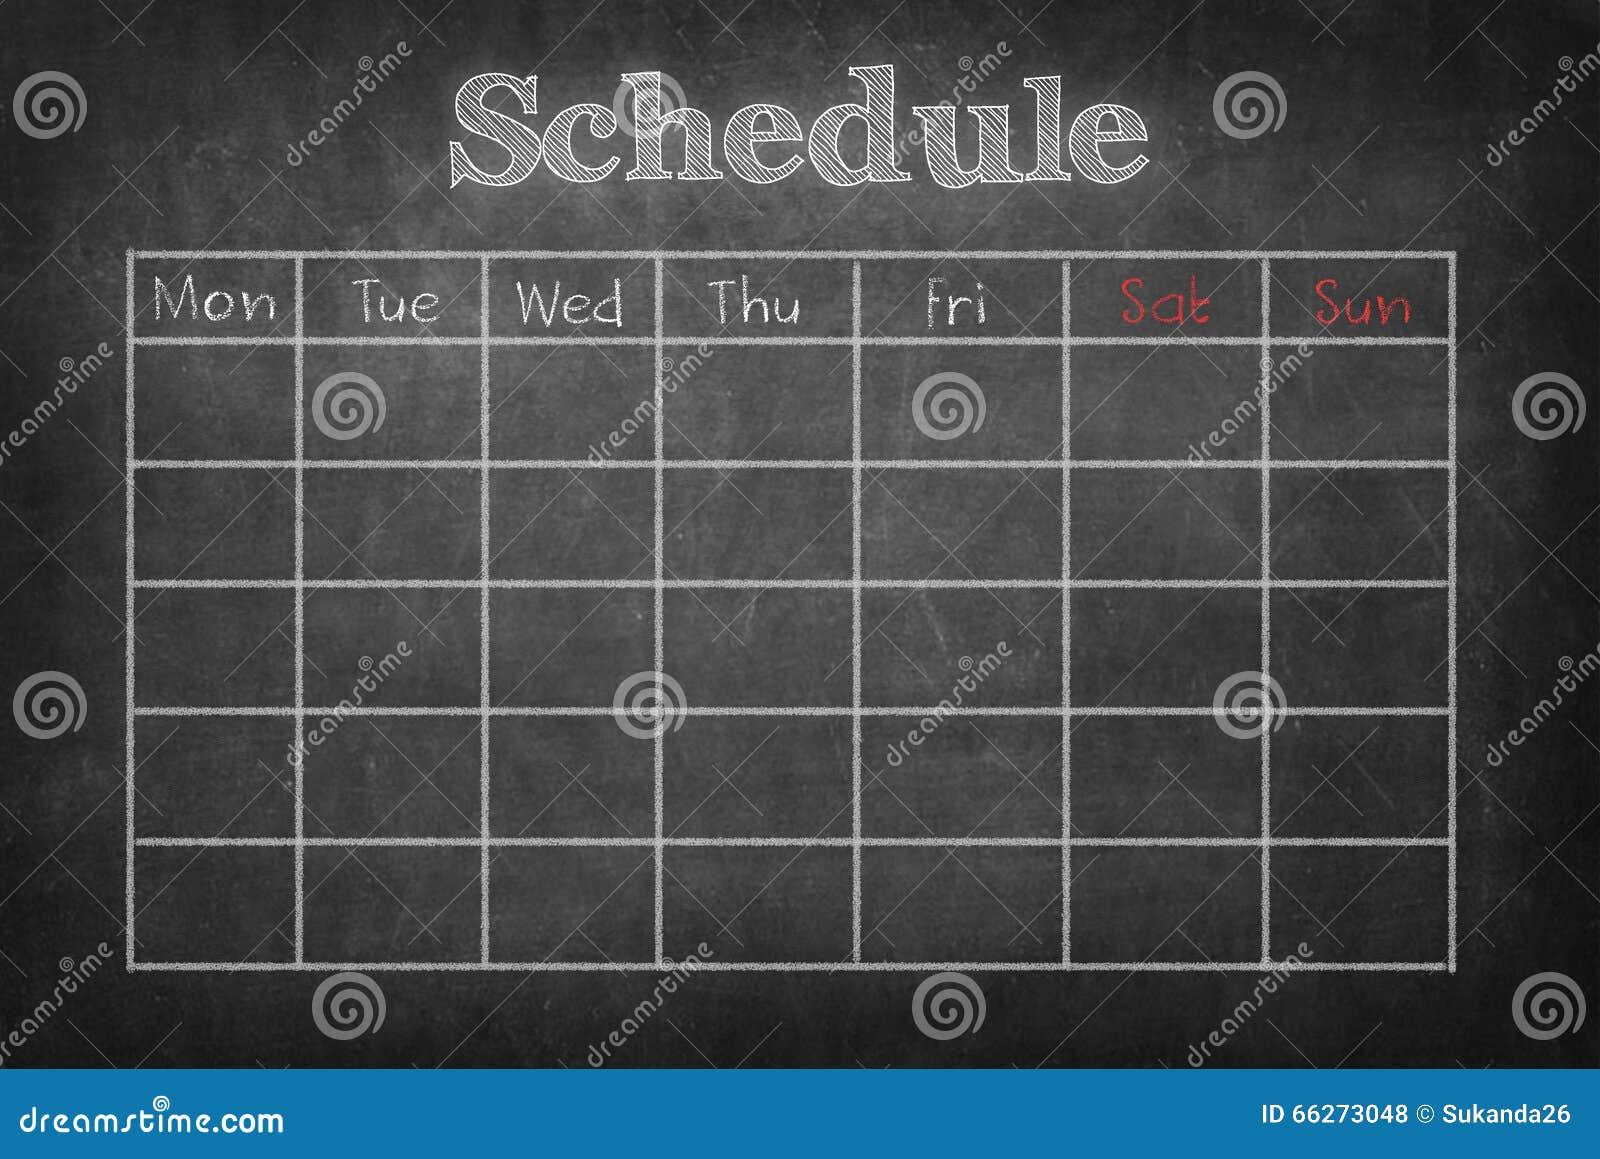 Schedule on